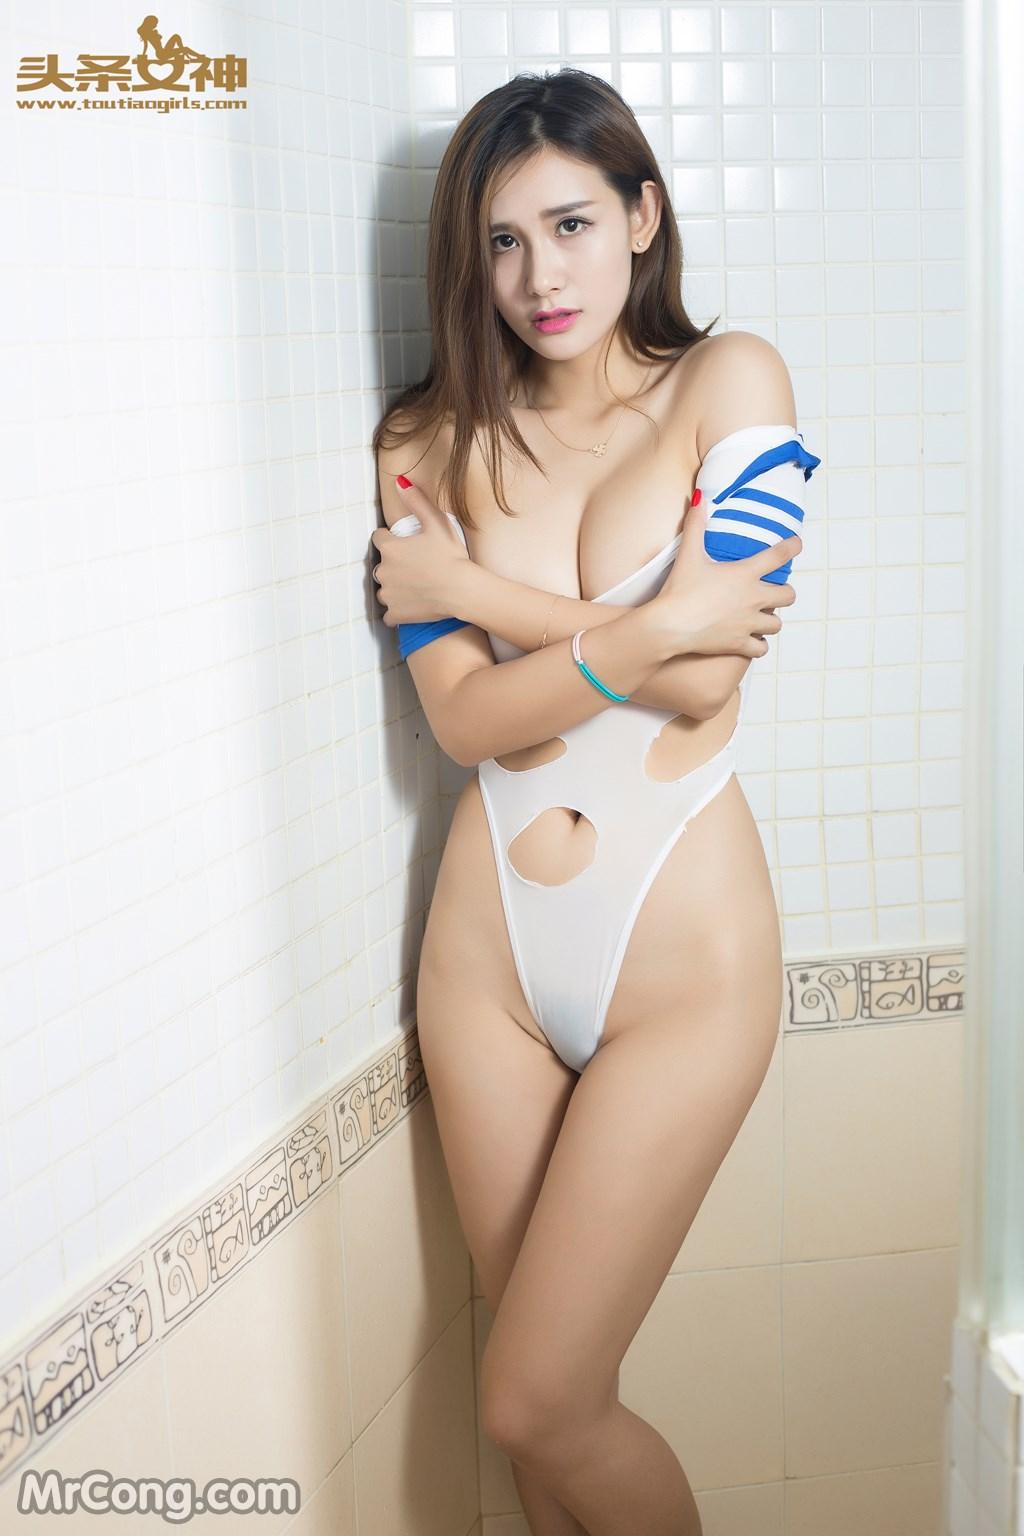 Image MrCong.com-TouTiao-2016-08-17-Si-Tong-1-004 in post TouTiao 2016-08-17: Người mẫu Si Tong (斯童) (23 ảnh)